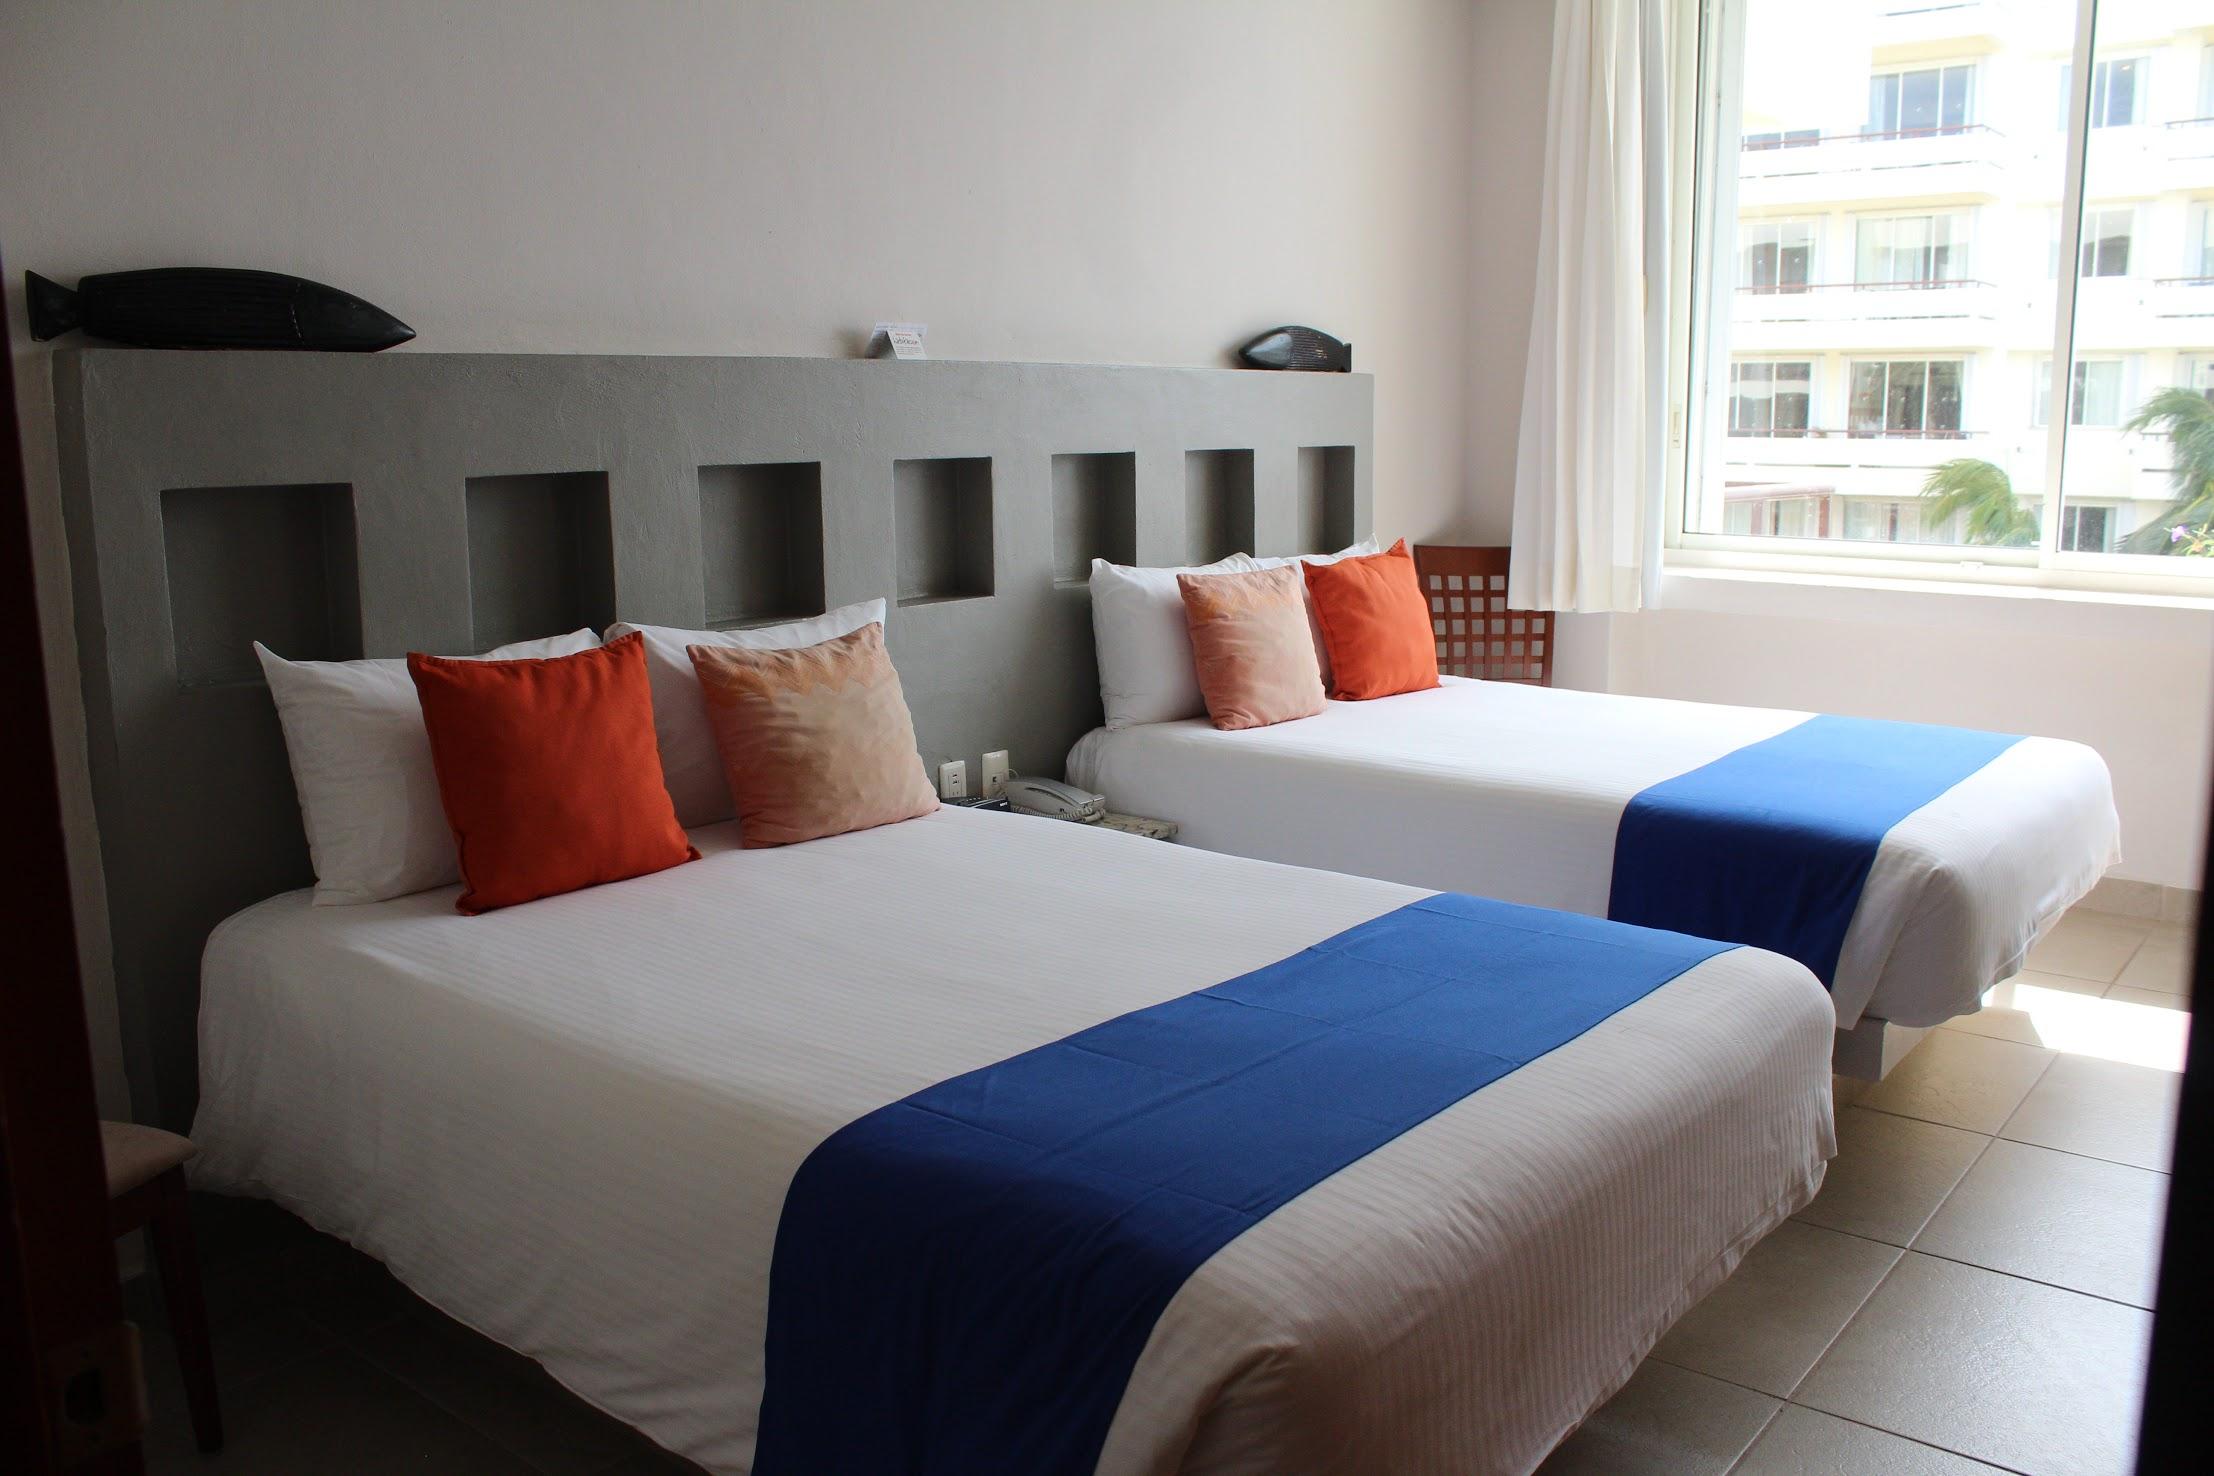 310 guest room.CR2.jpg